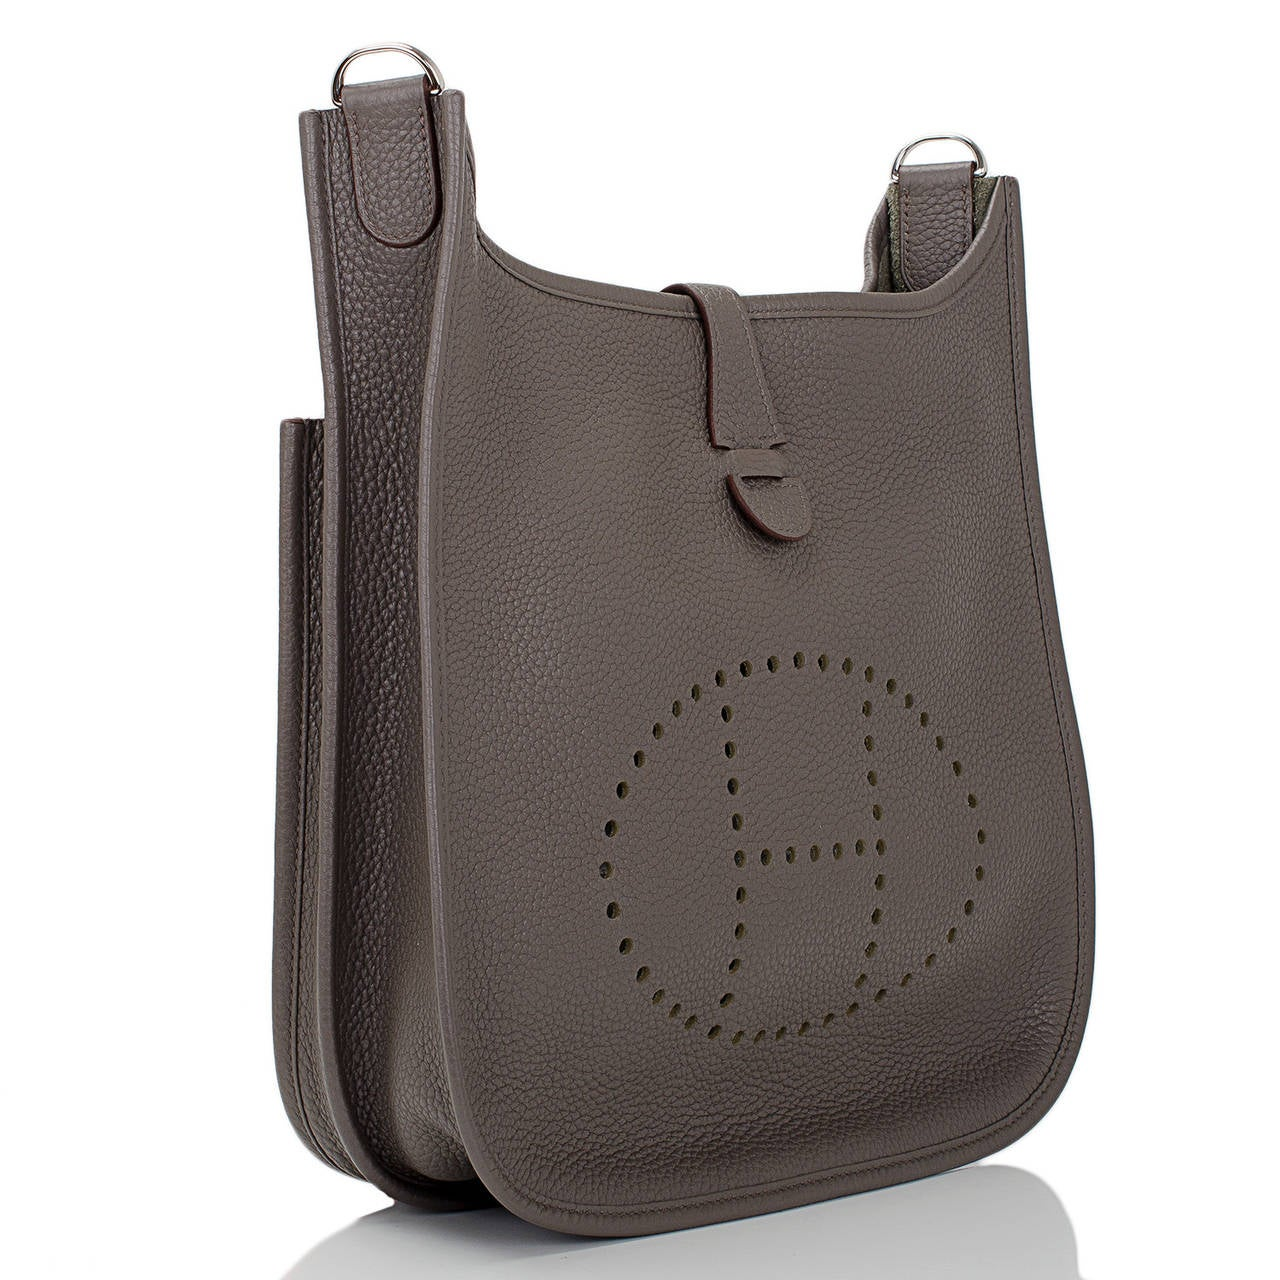 long purse - Hermes Etain Clemence Evelyne III PM at 1stdibs